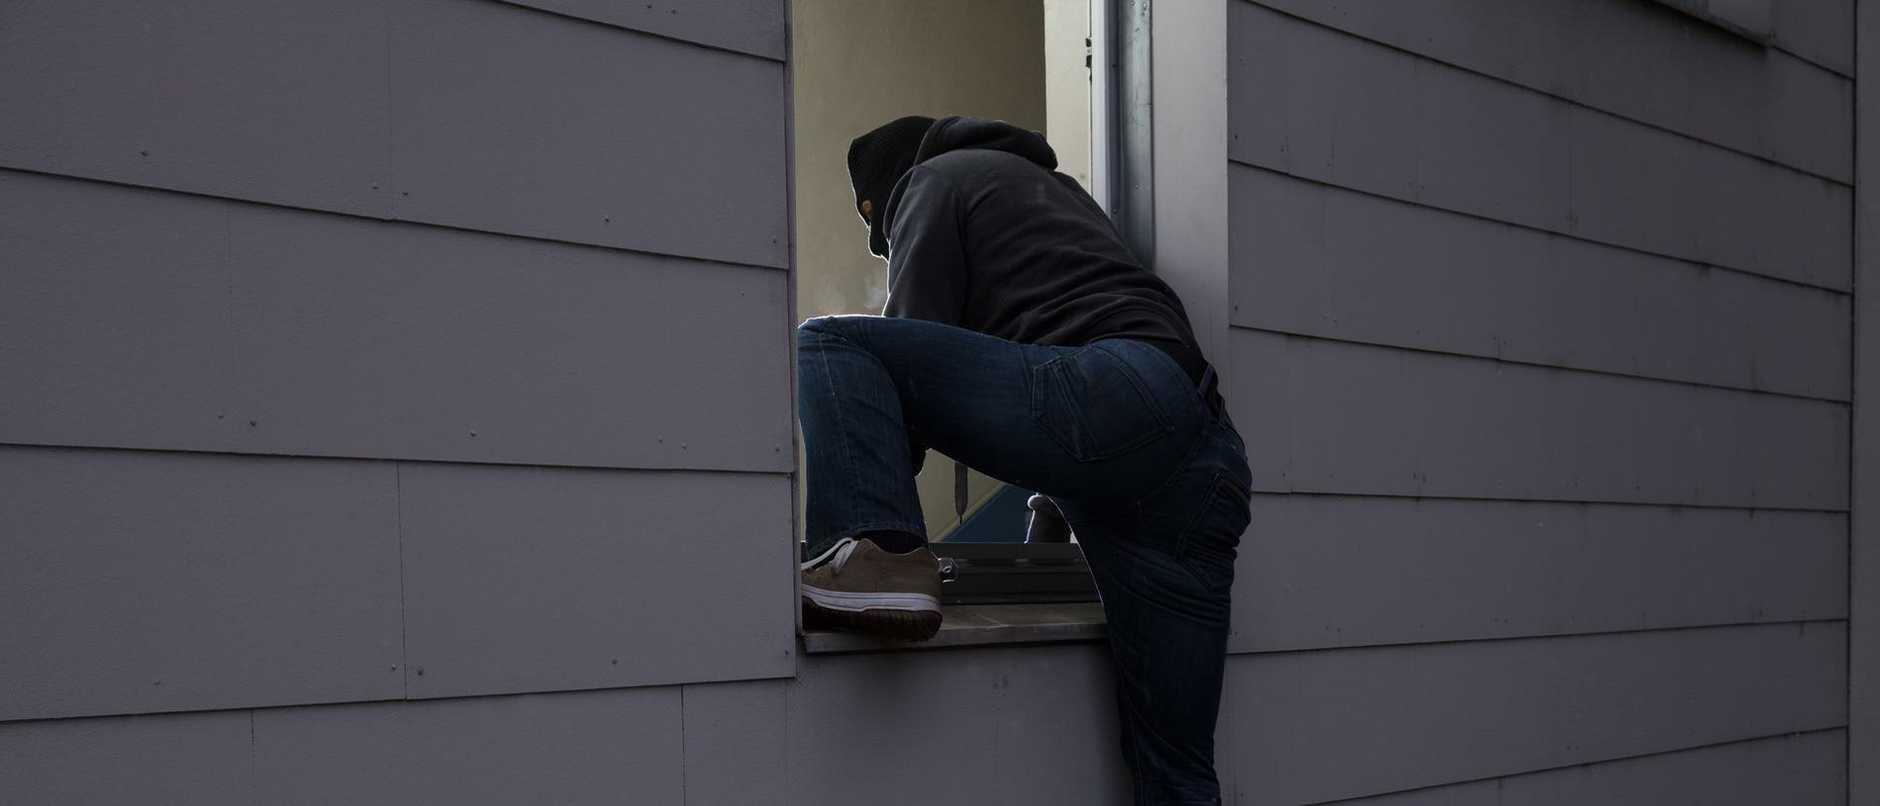 Burglar Entering House Through Window